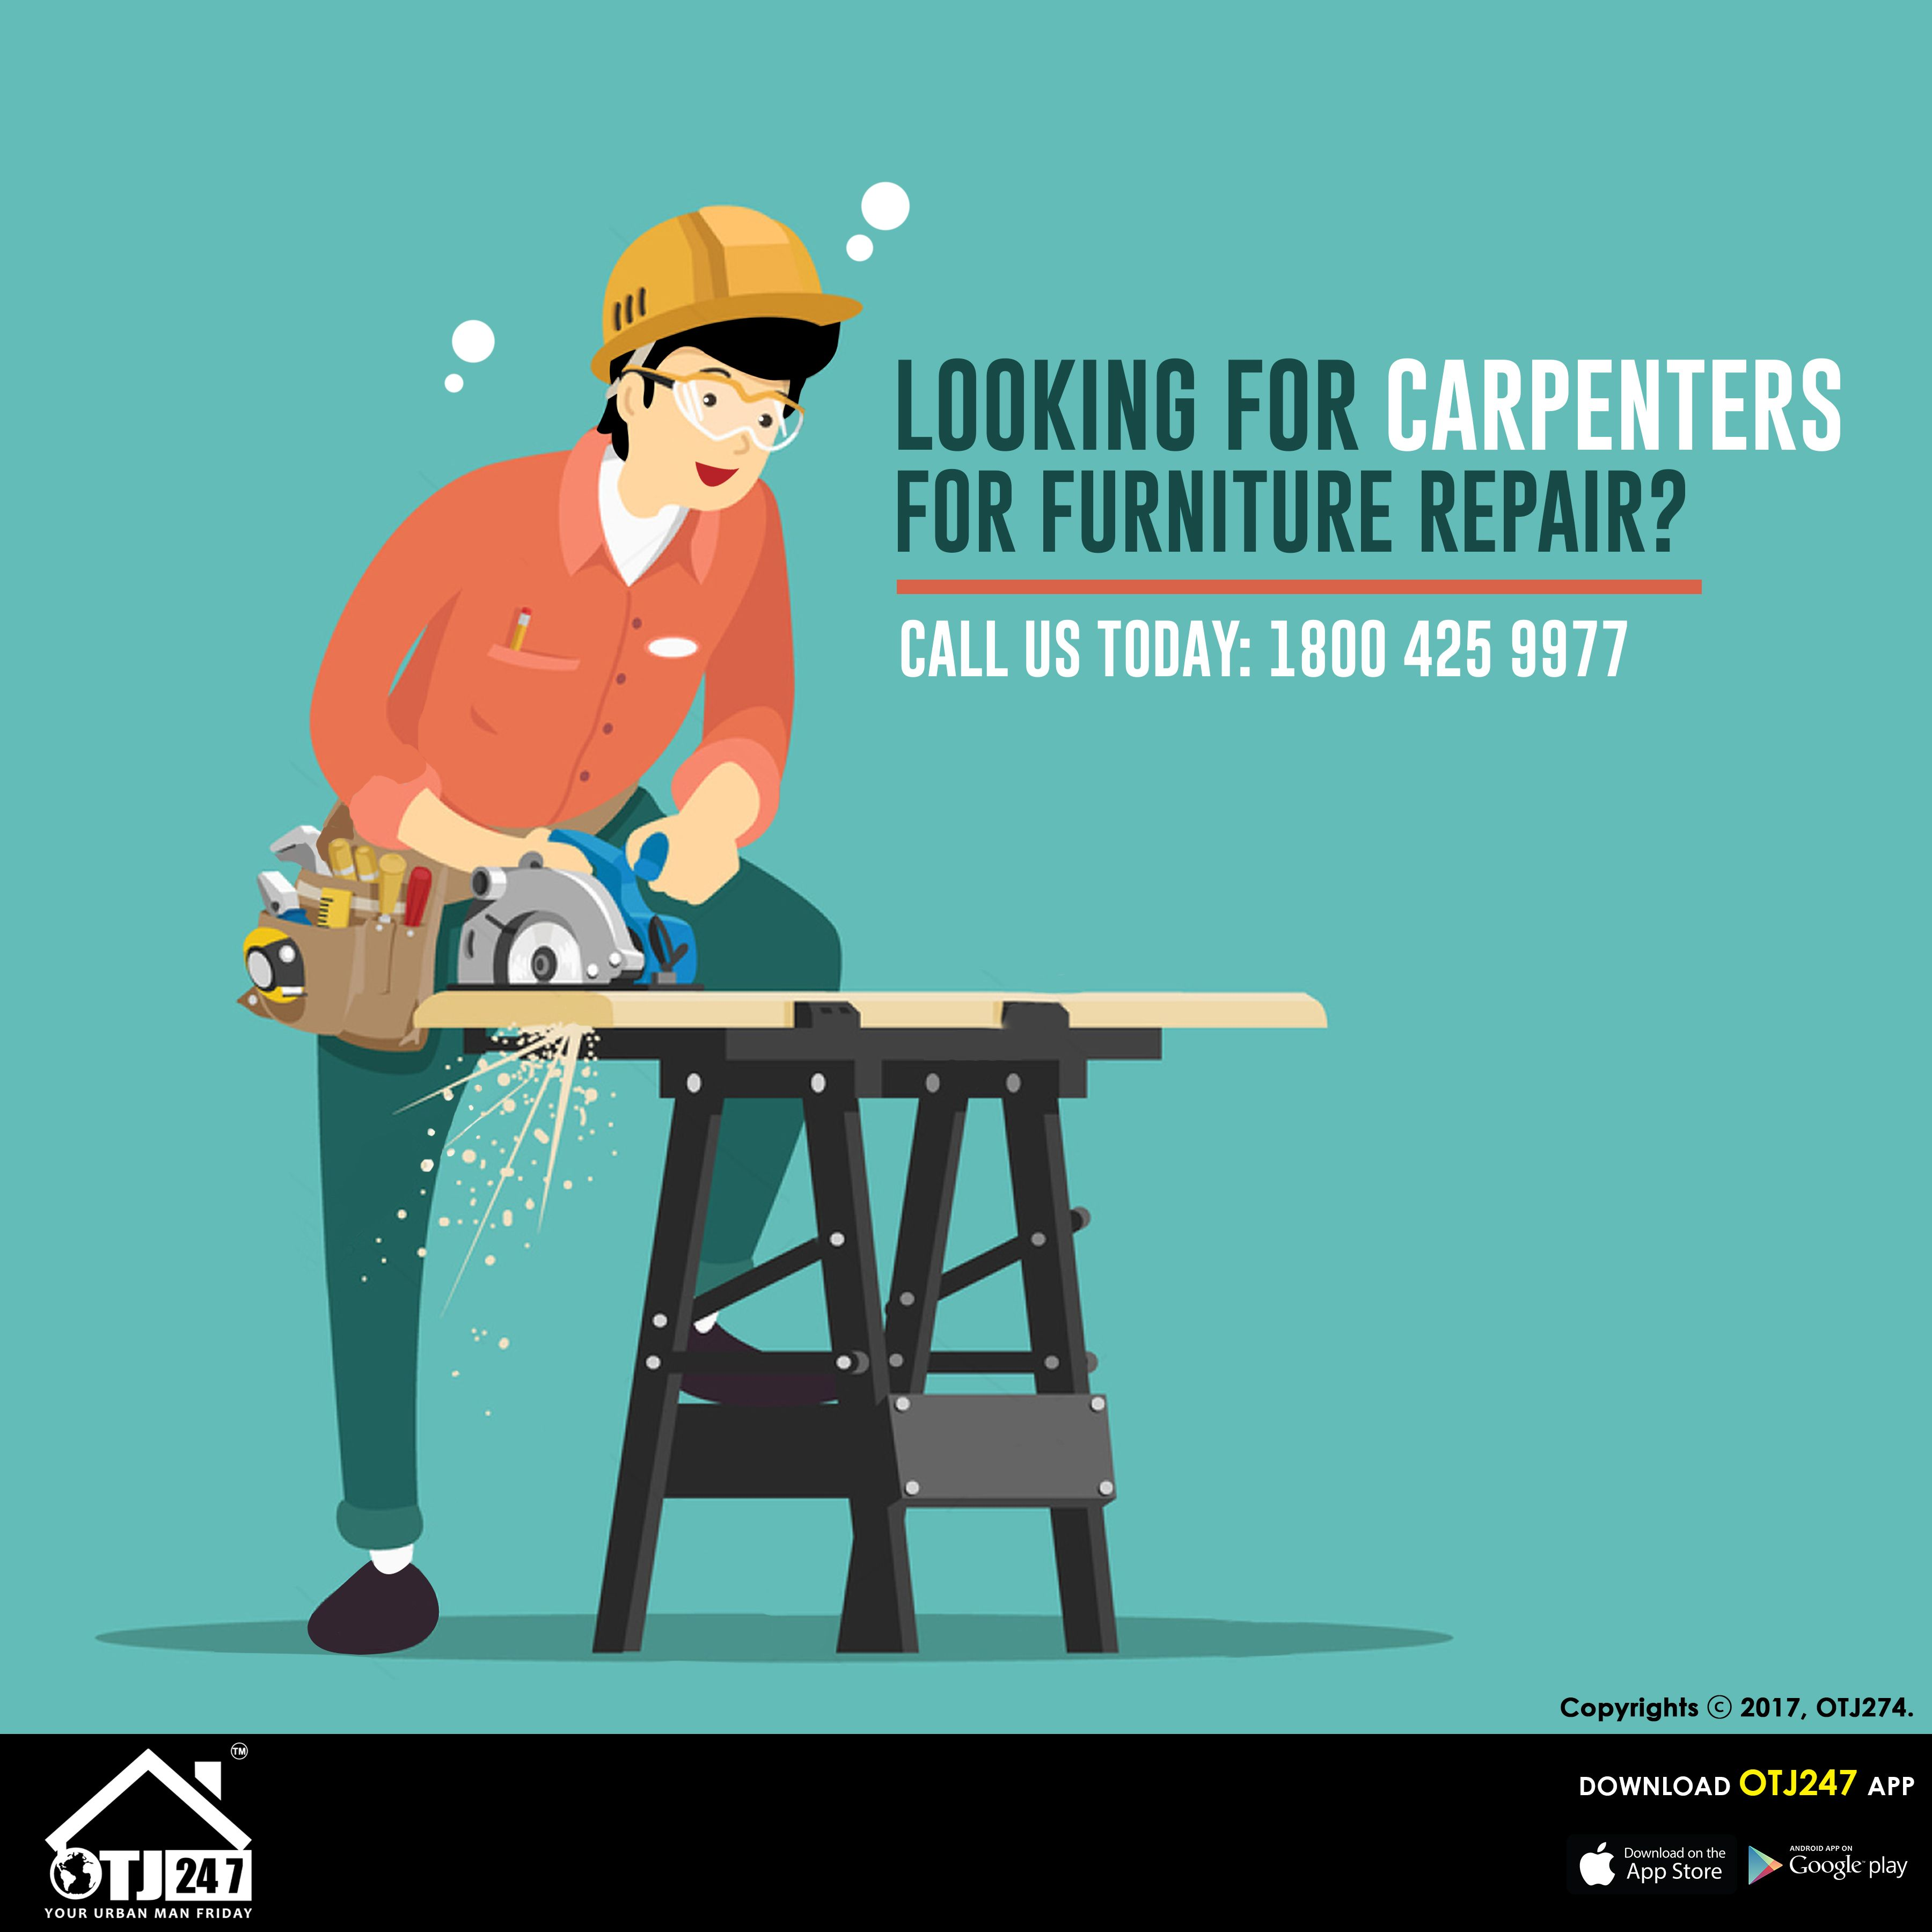 Looking For Carpenters For Furniture Repair? Book Now